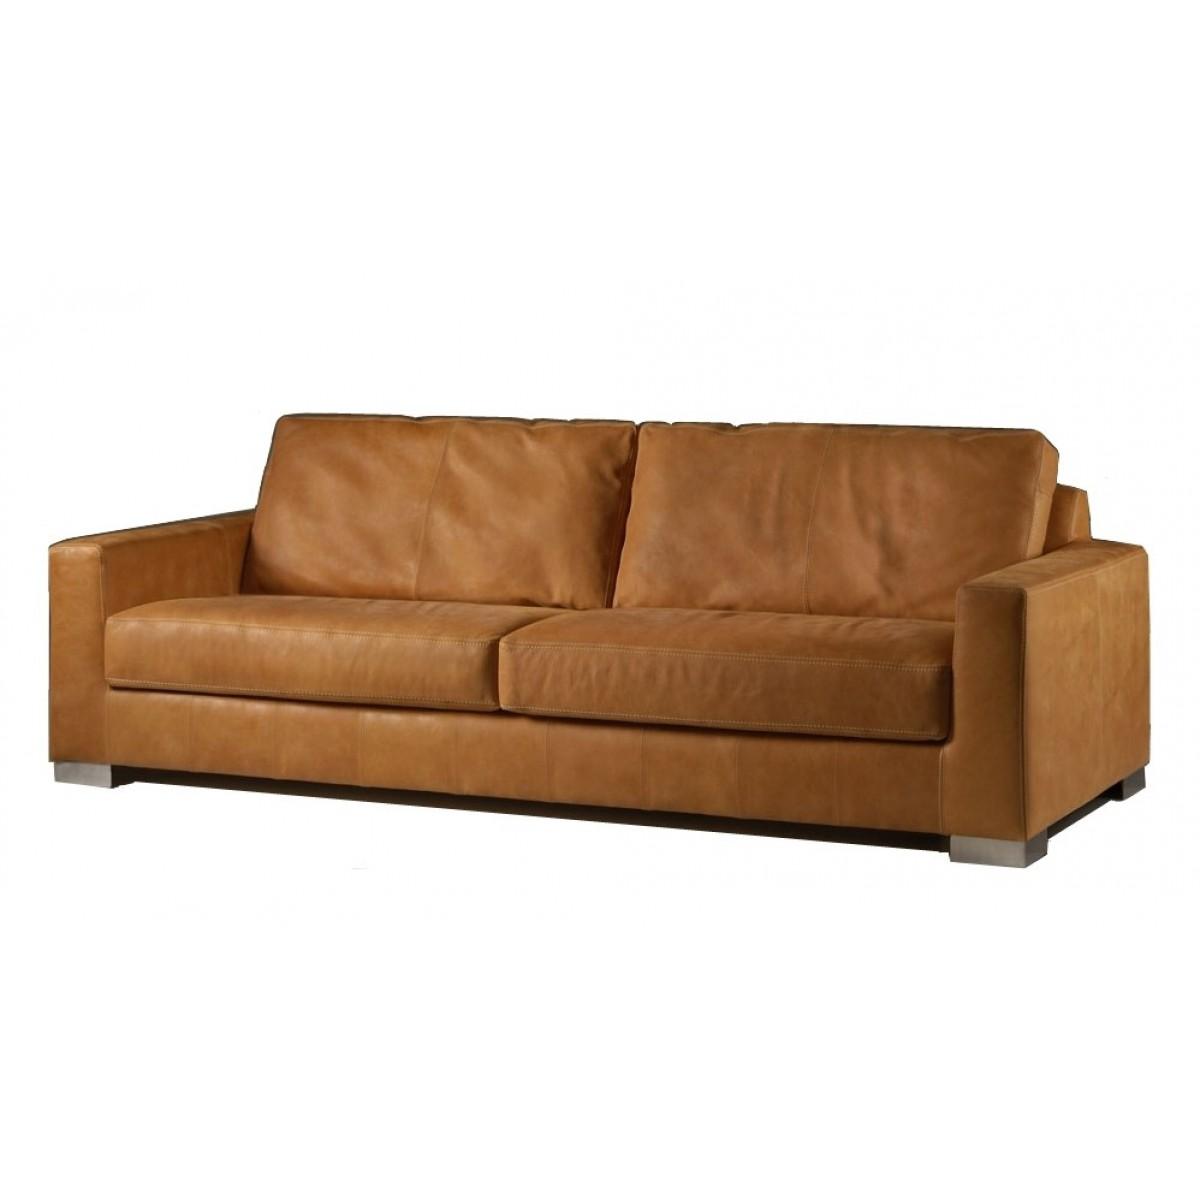 eldorado-bank-sofa-het-anker-africa-leder-vrij